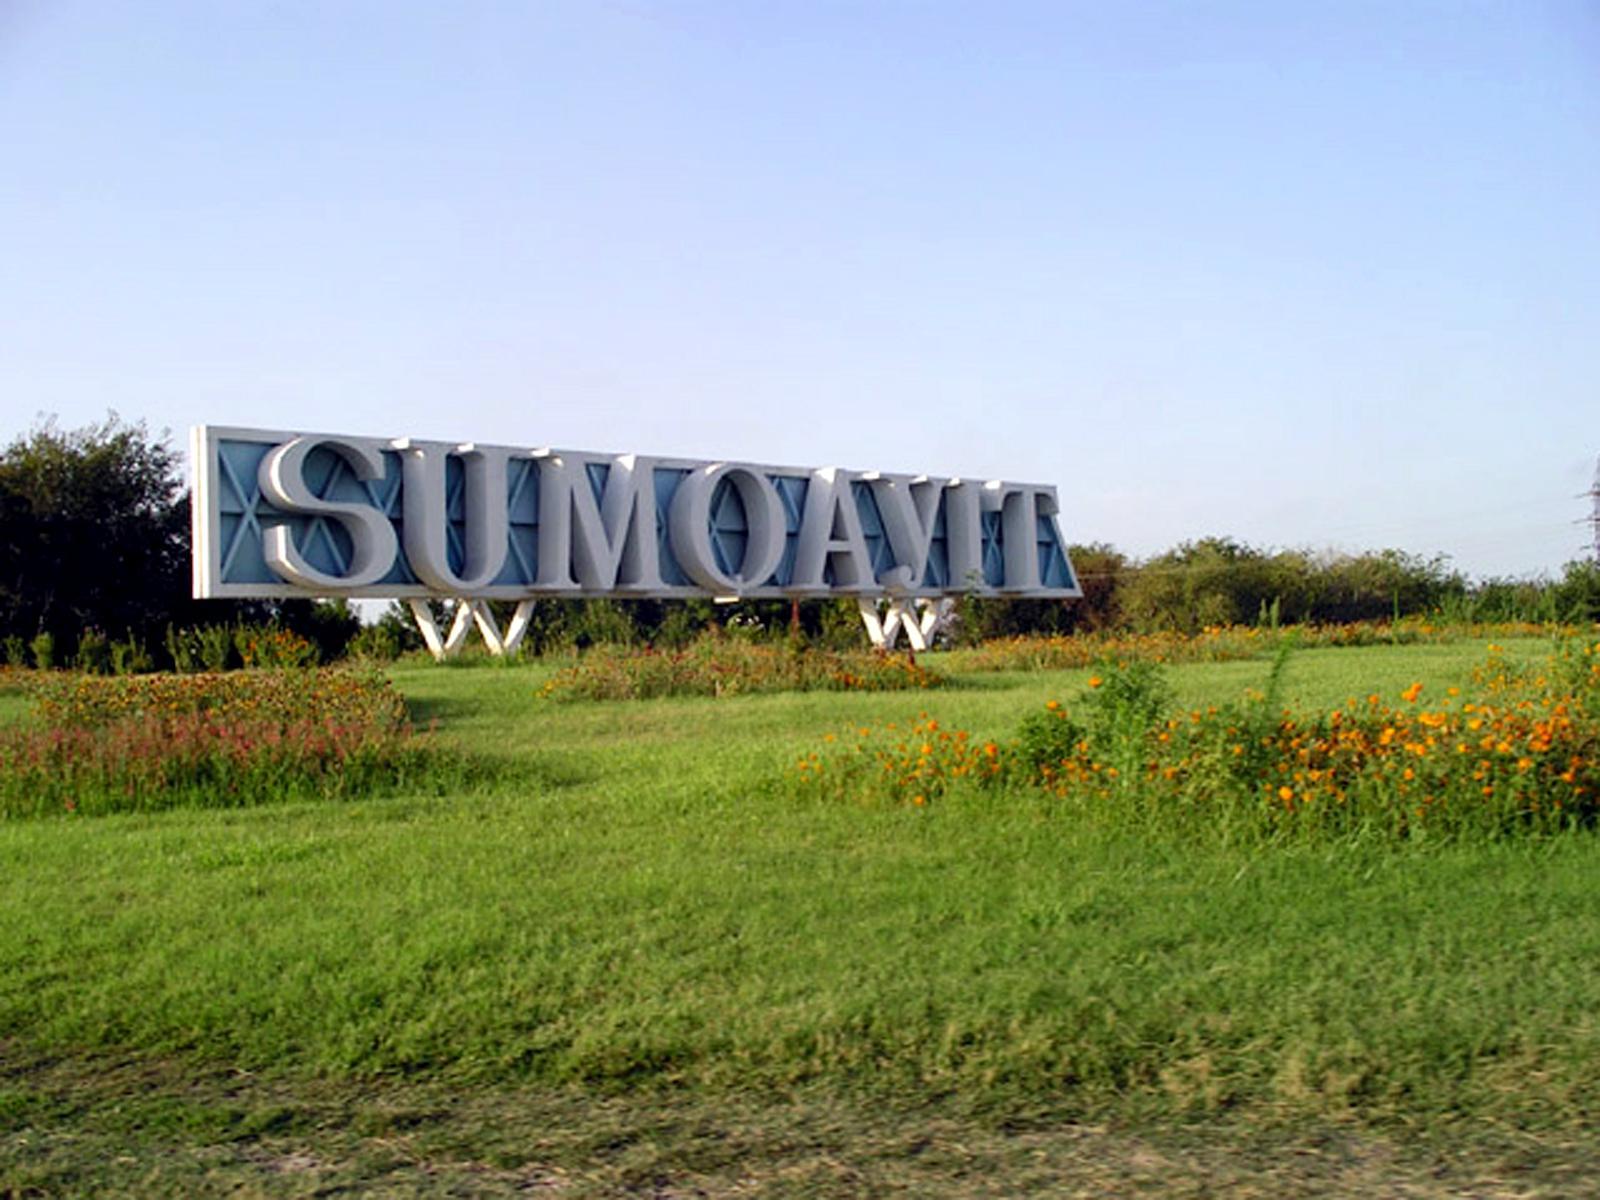 http://bizimsumqayit.narod.ru/images/sum/23_big.jpg